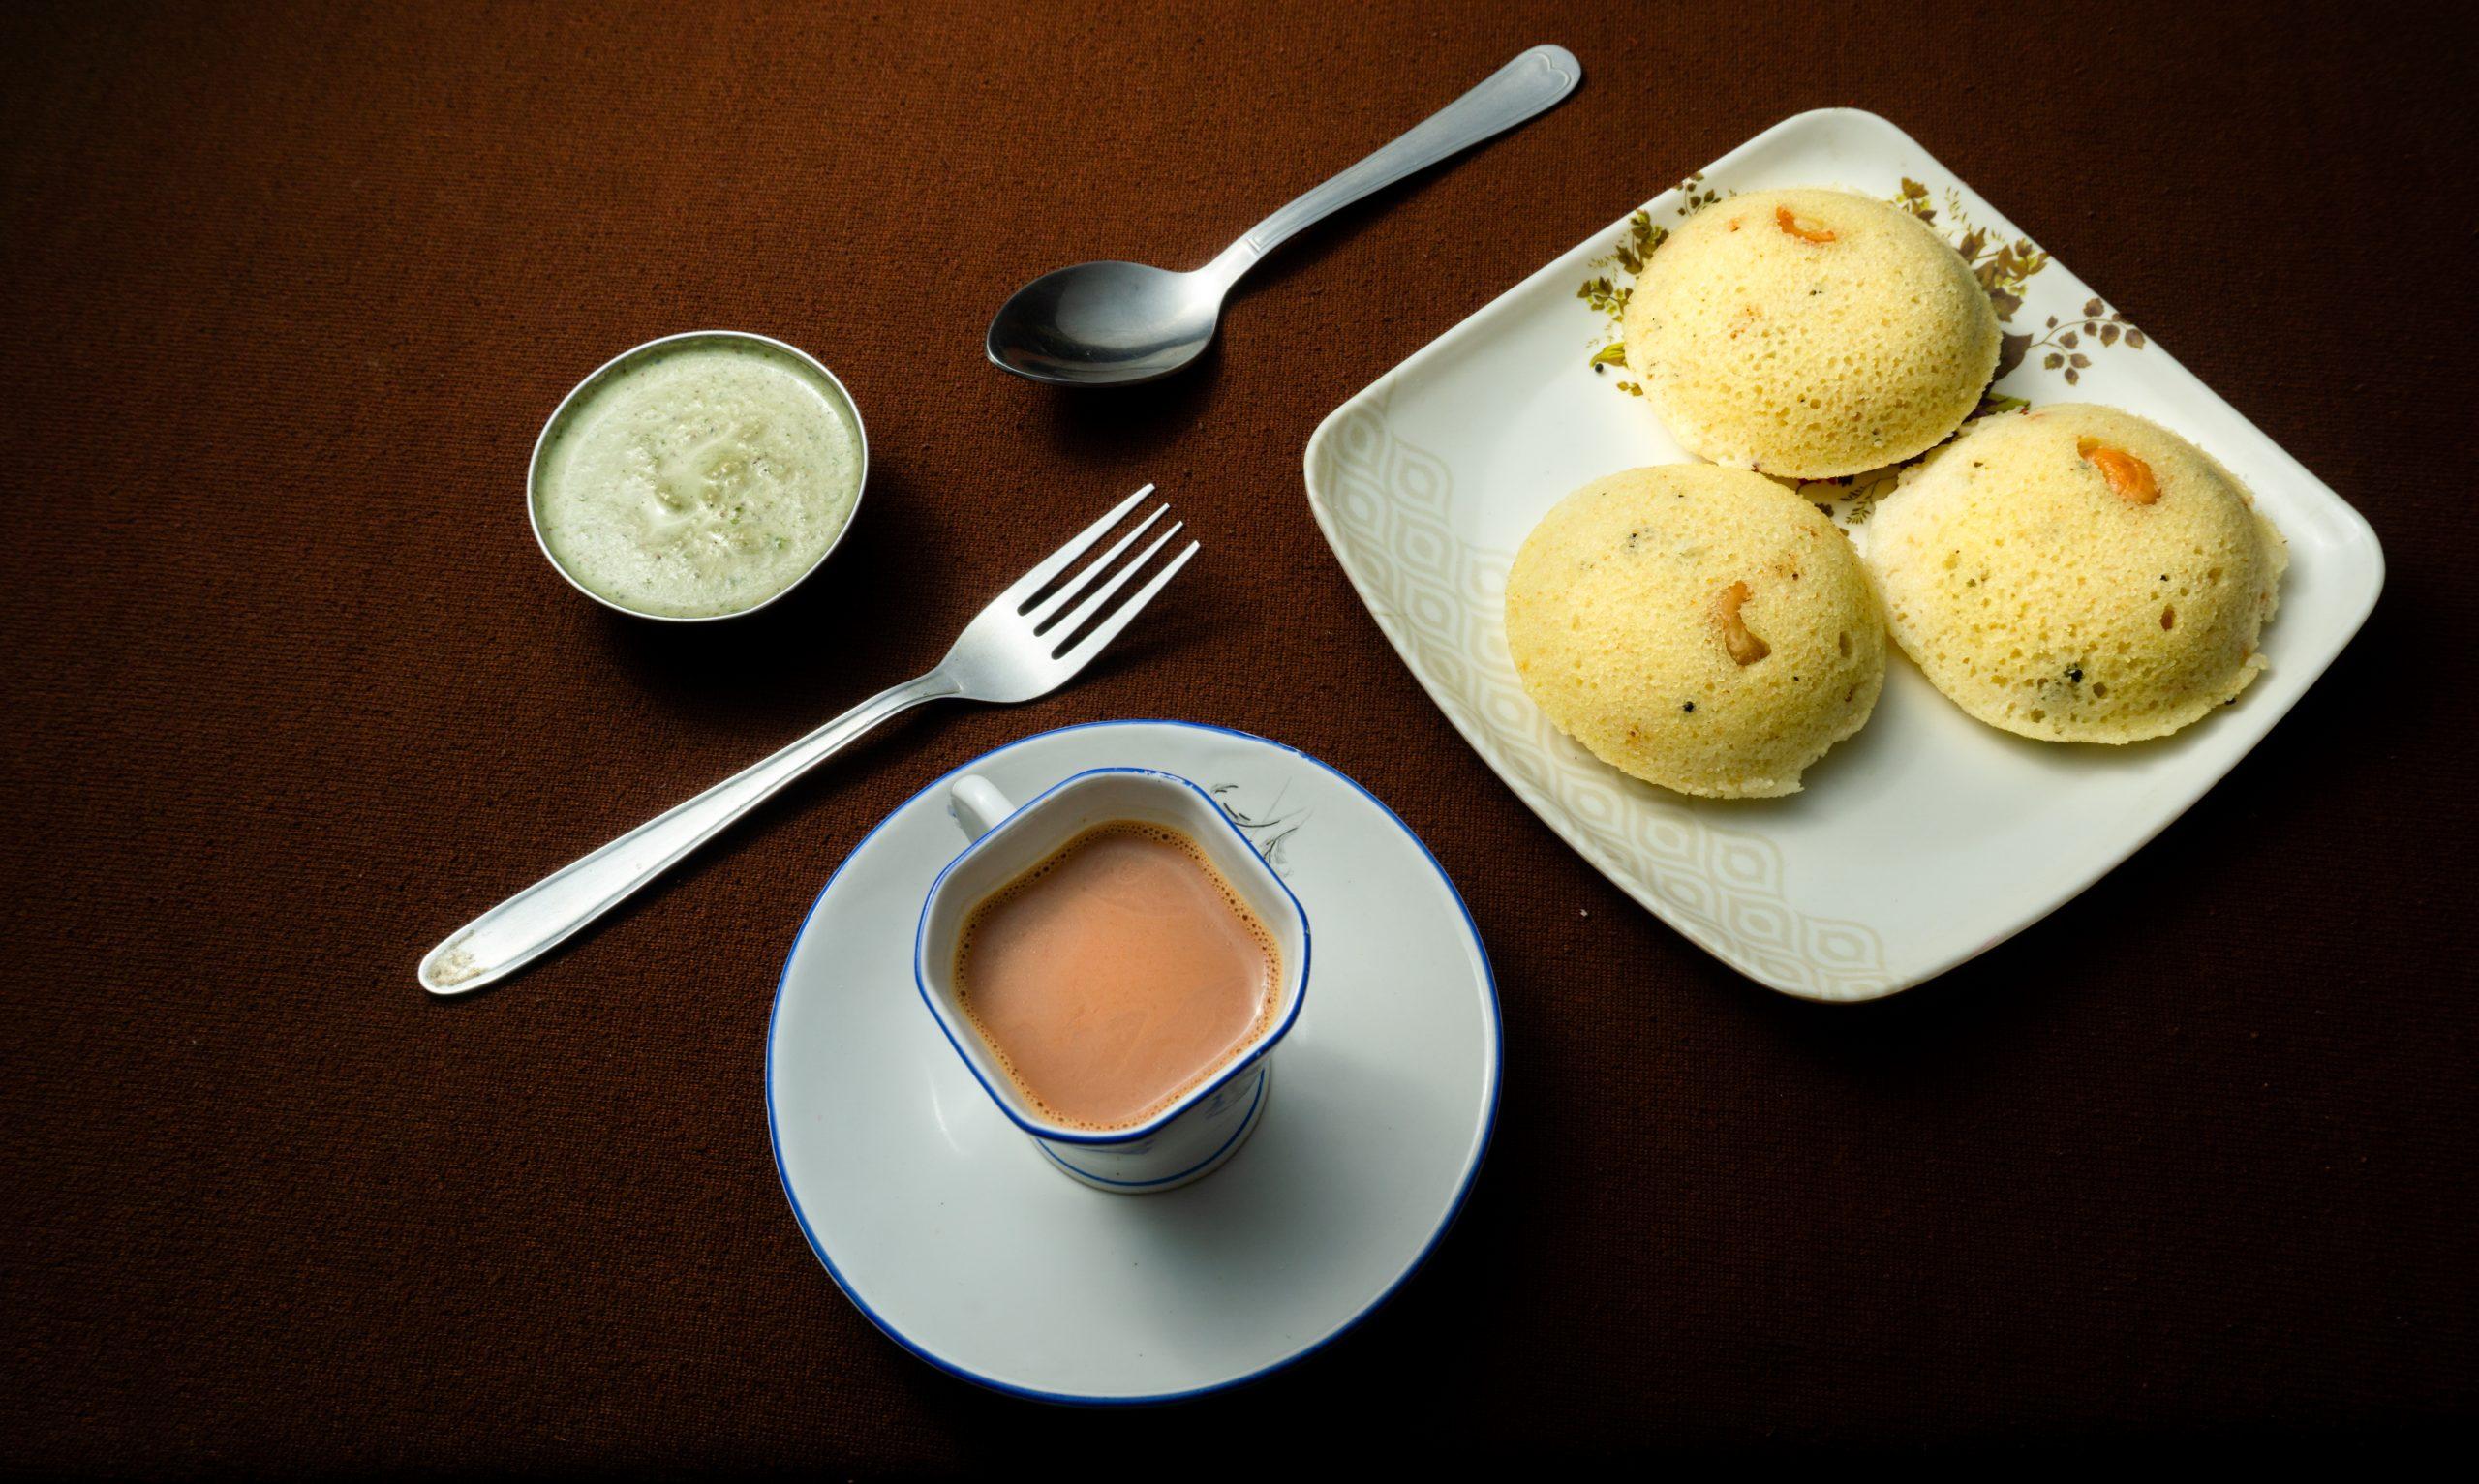 idli chutney and tea